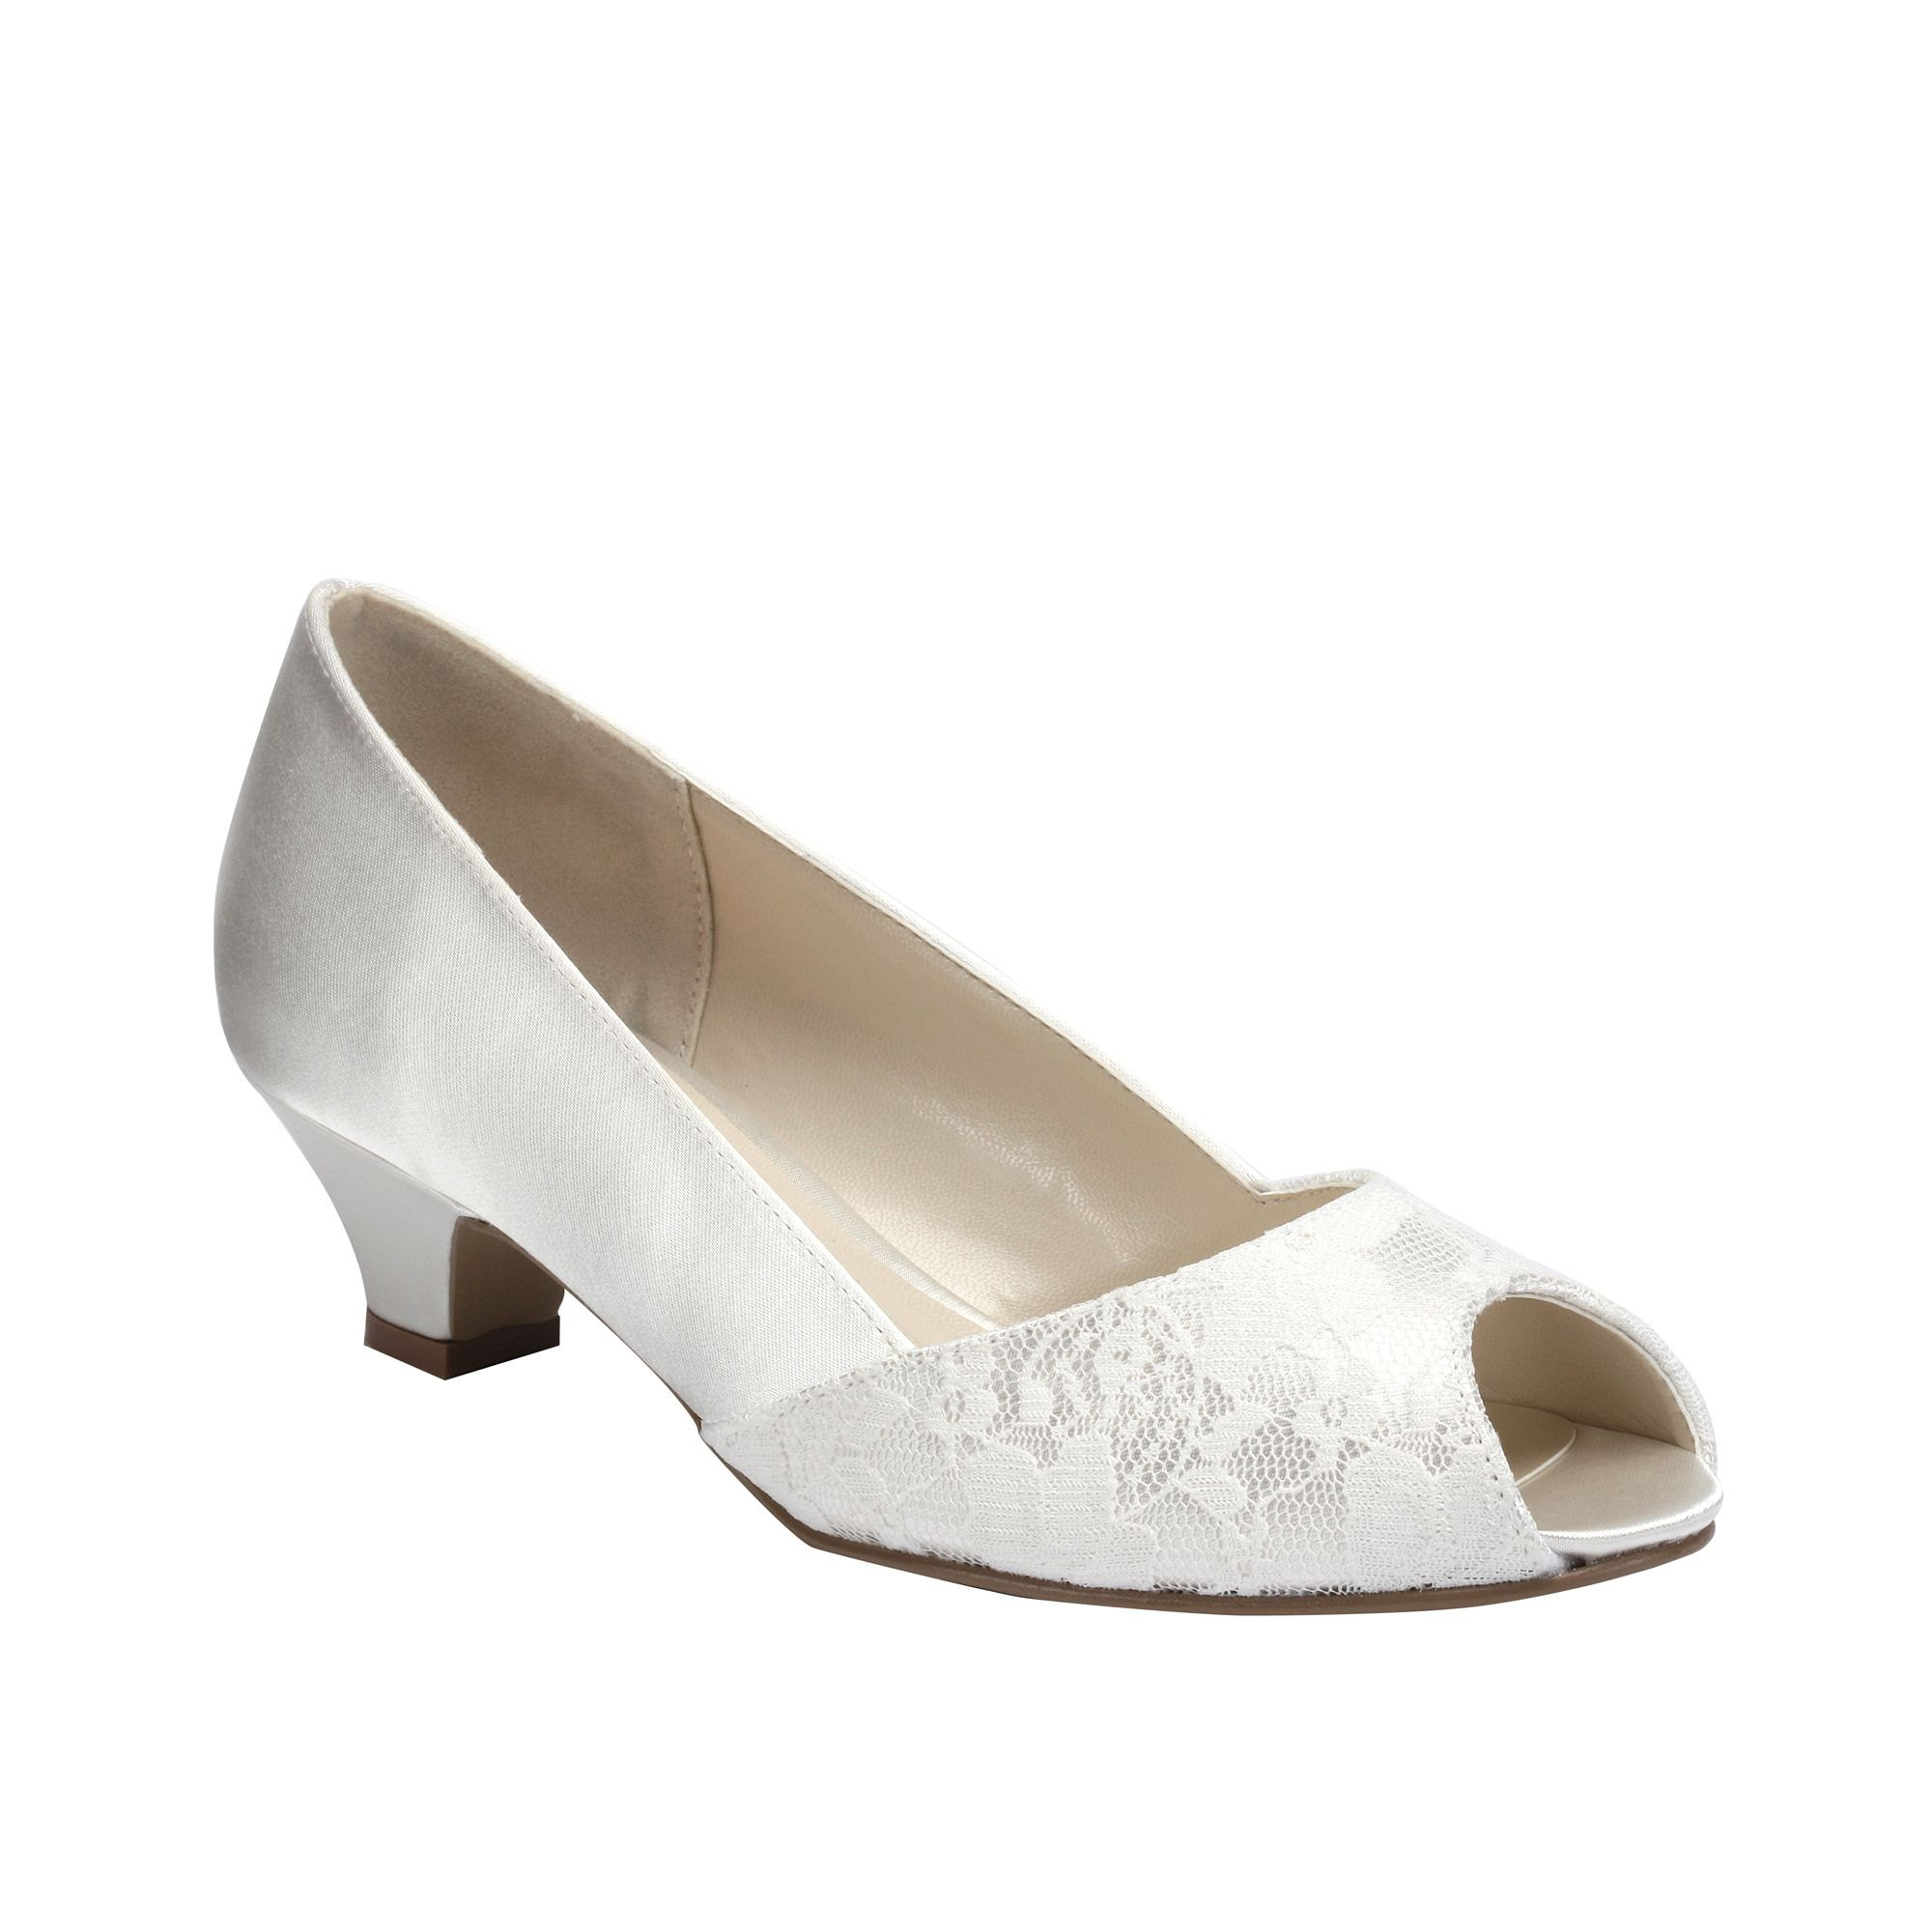 pink wedding shoes low heel photo - 1